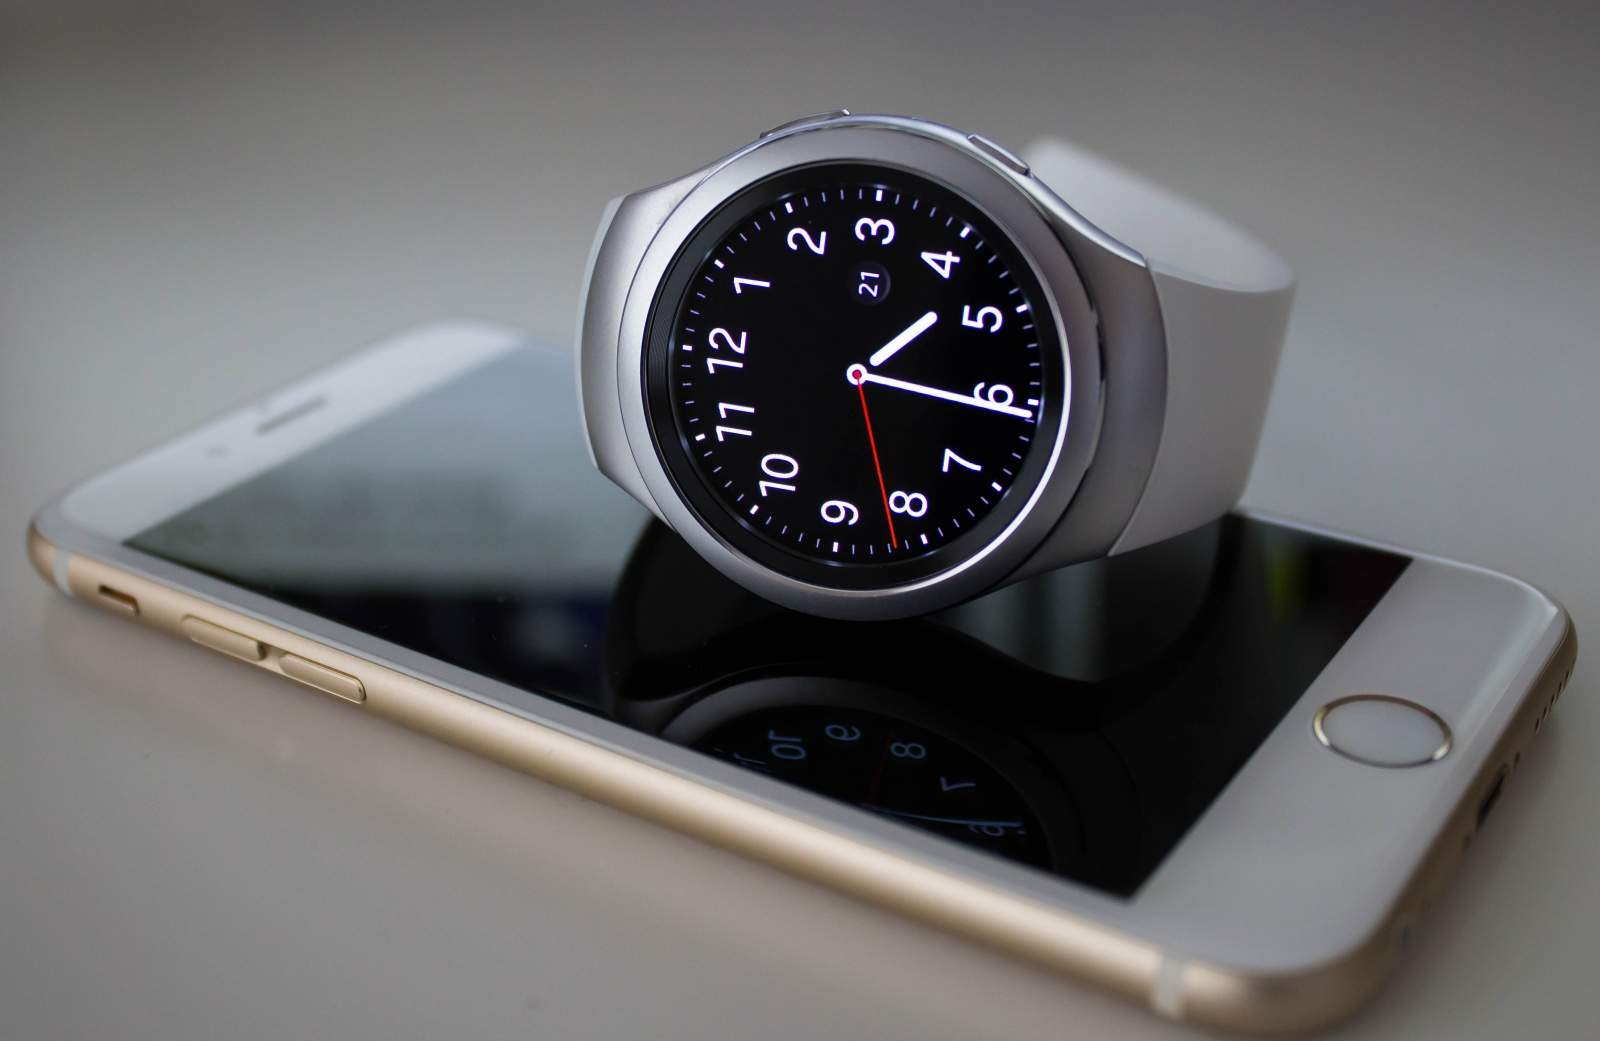 Samsung Gear Fit iOS indir, Samsung Saatlere iPhone Desteği